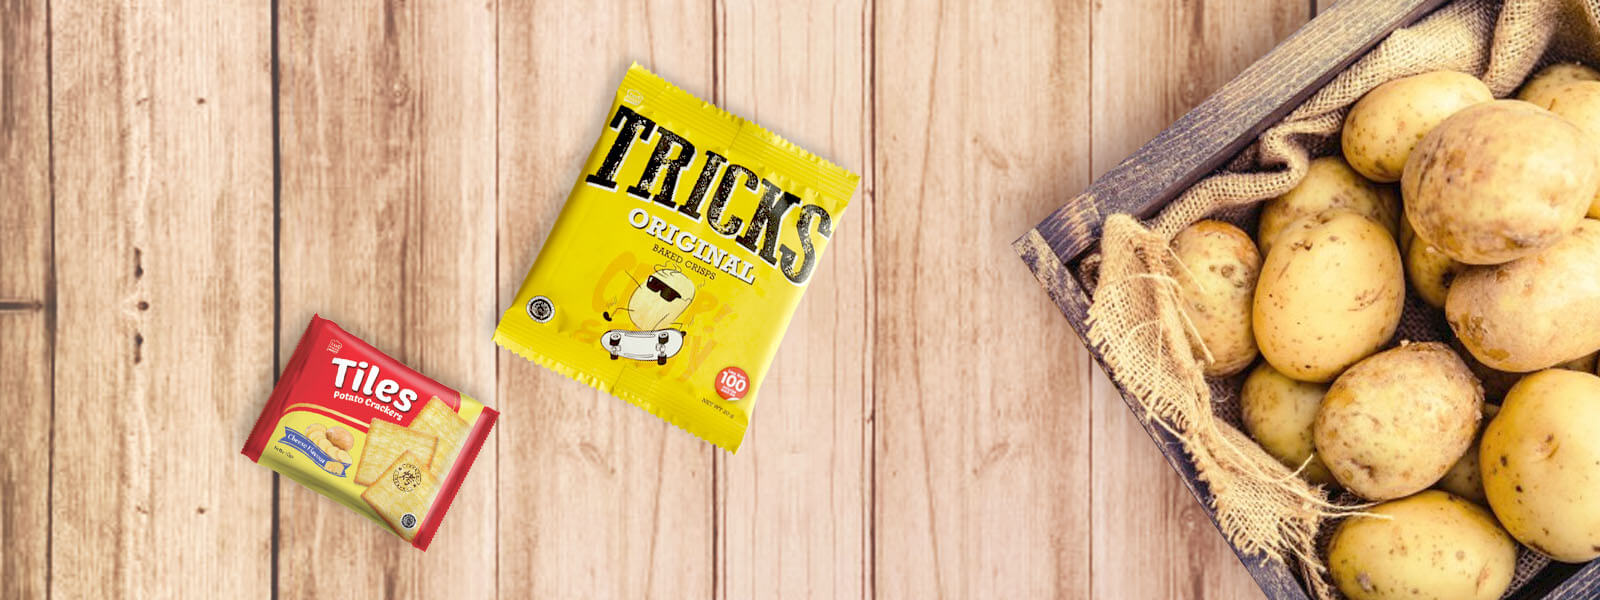 Crisps - Tays Bakers